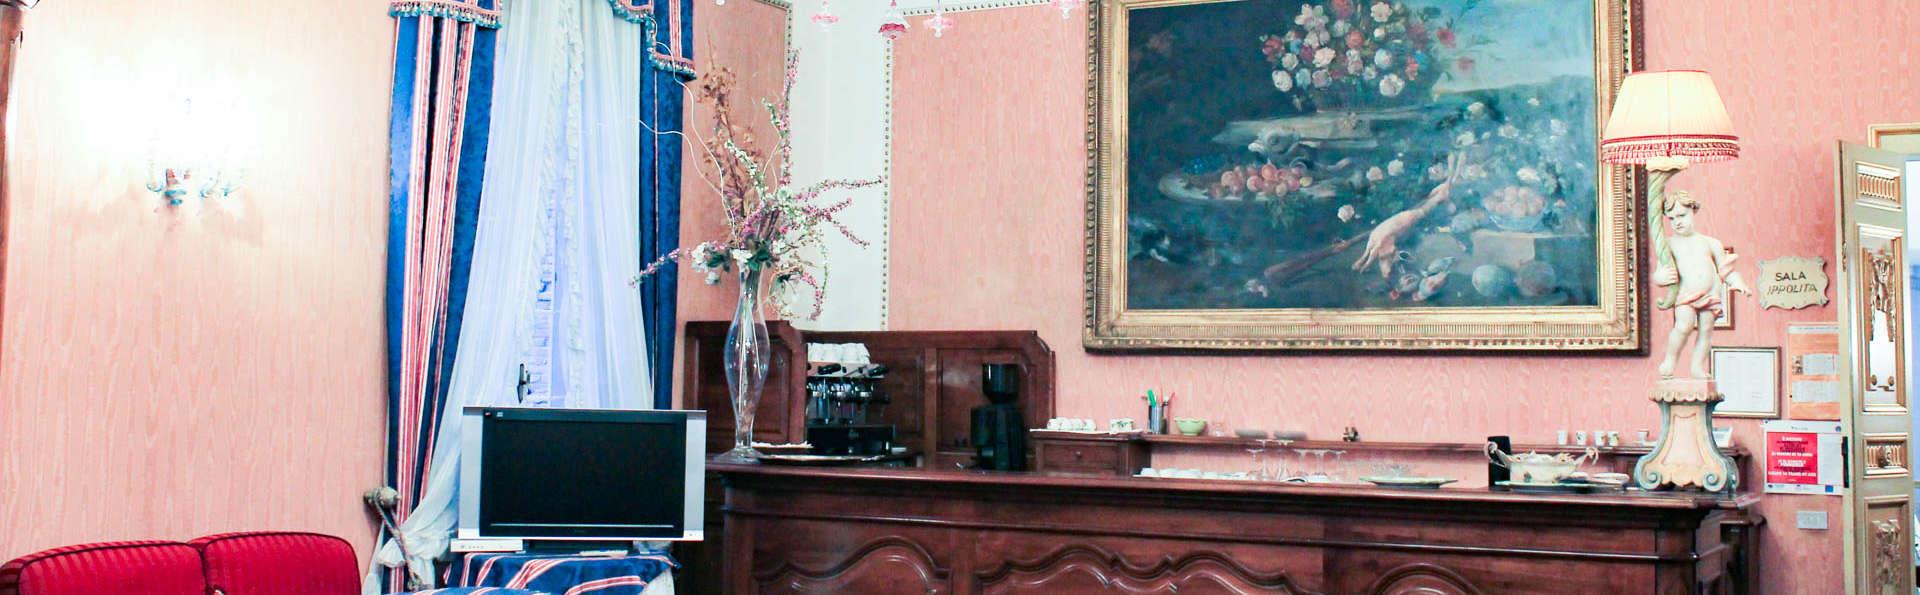 Hotel Duchessa Isabella - EDIT_LOOBY.jpg